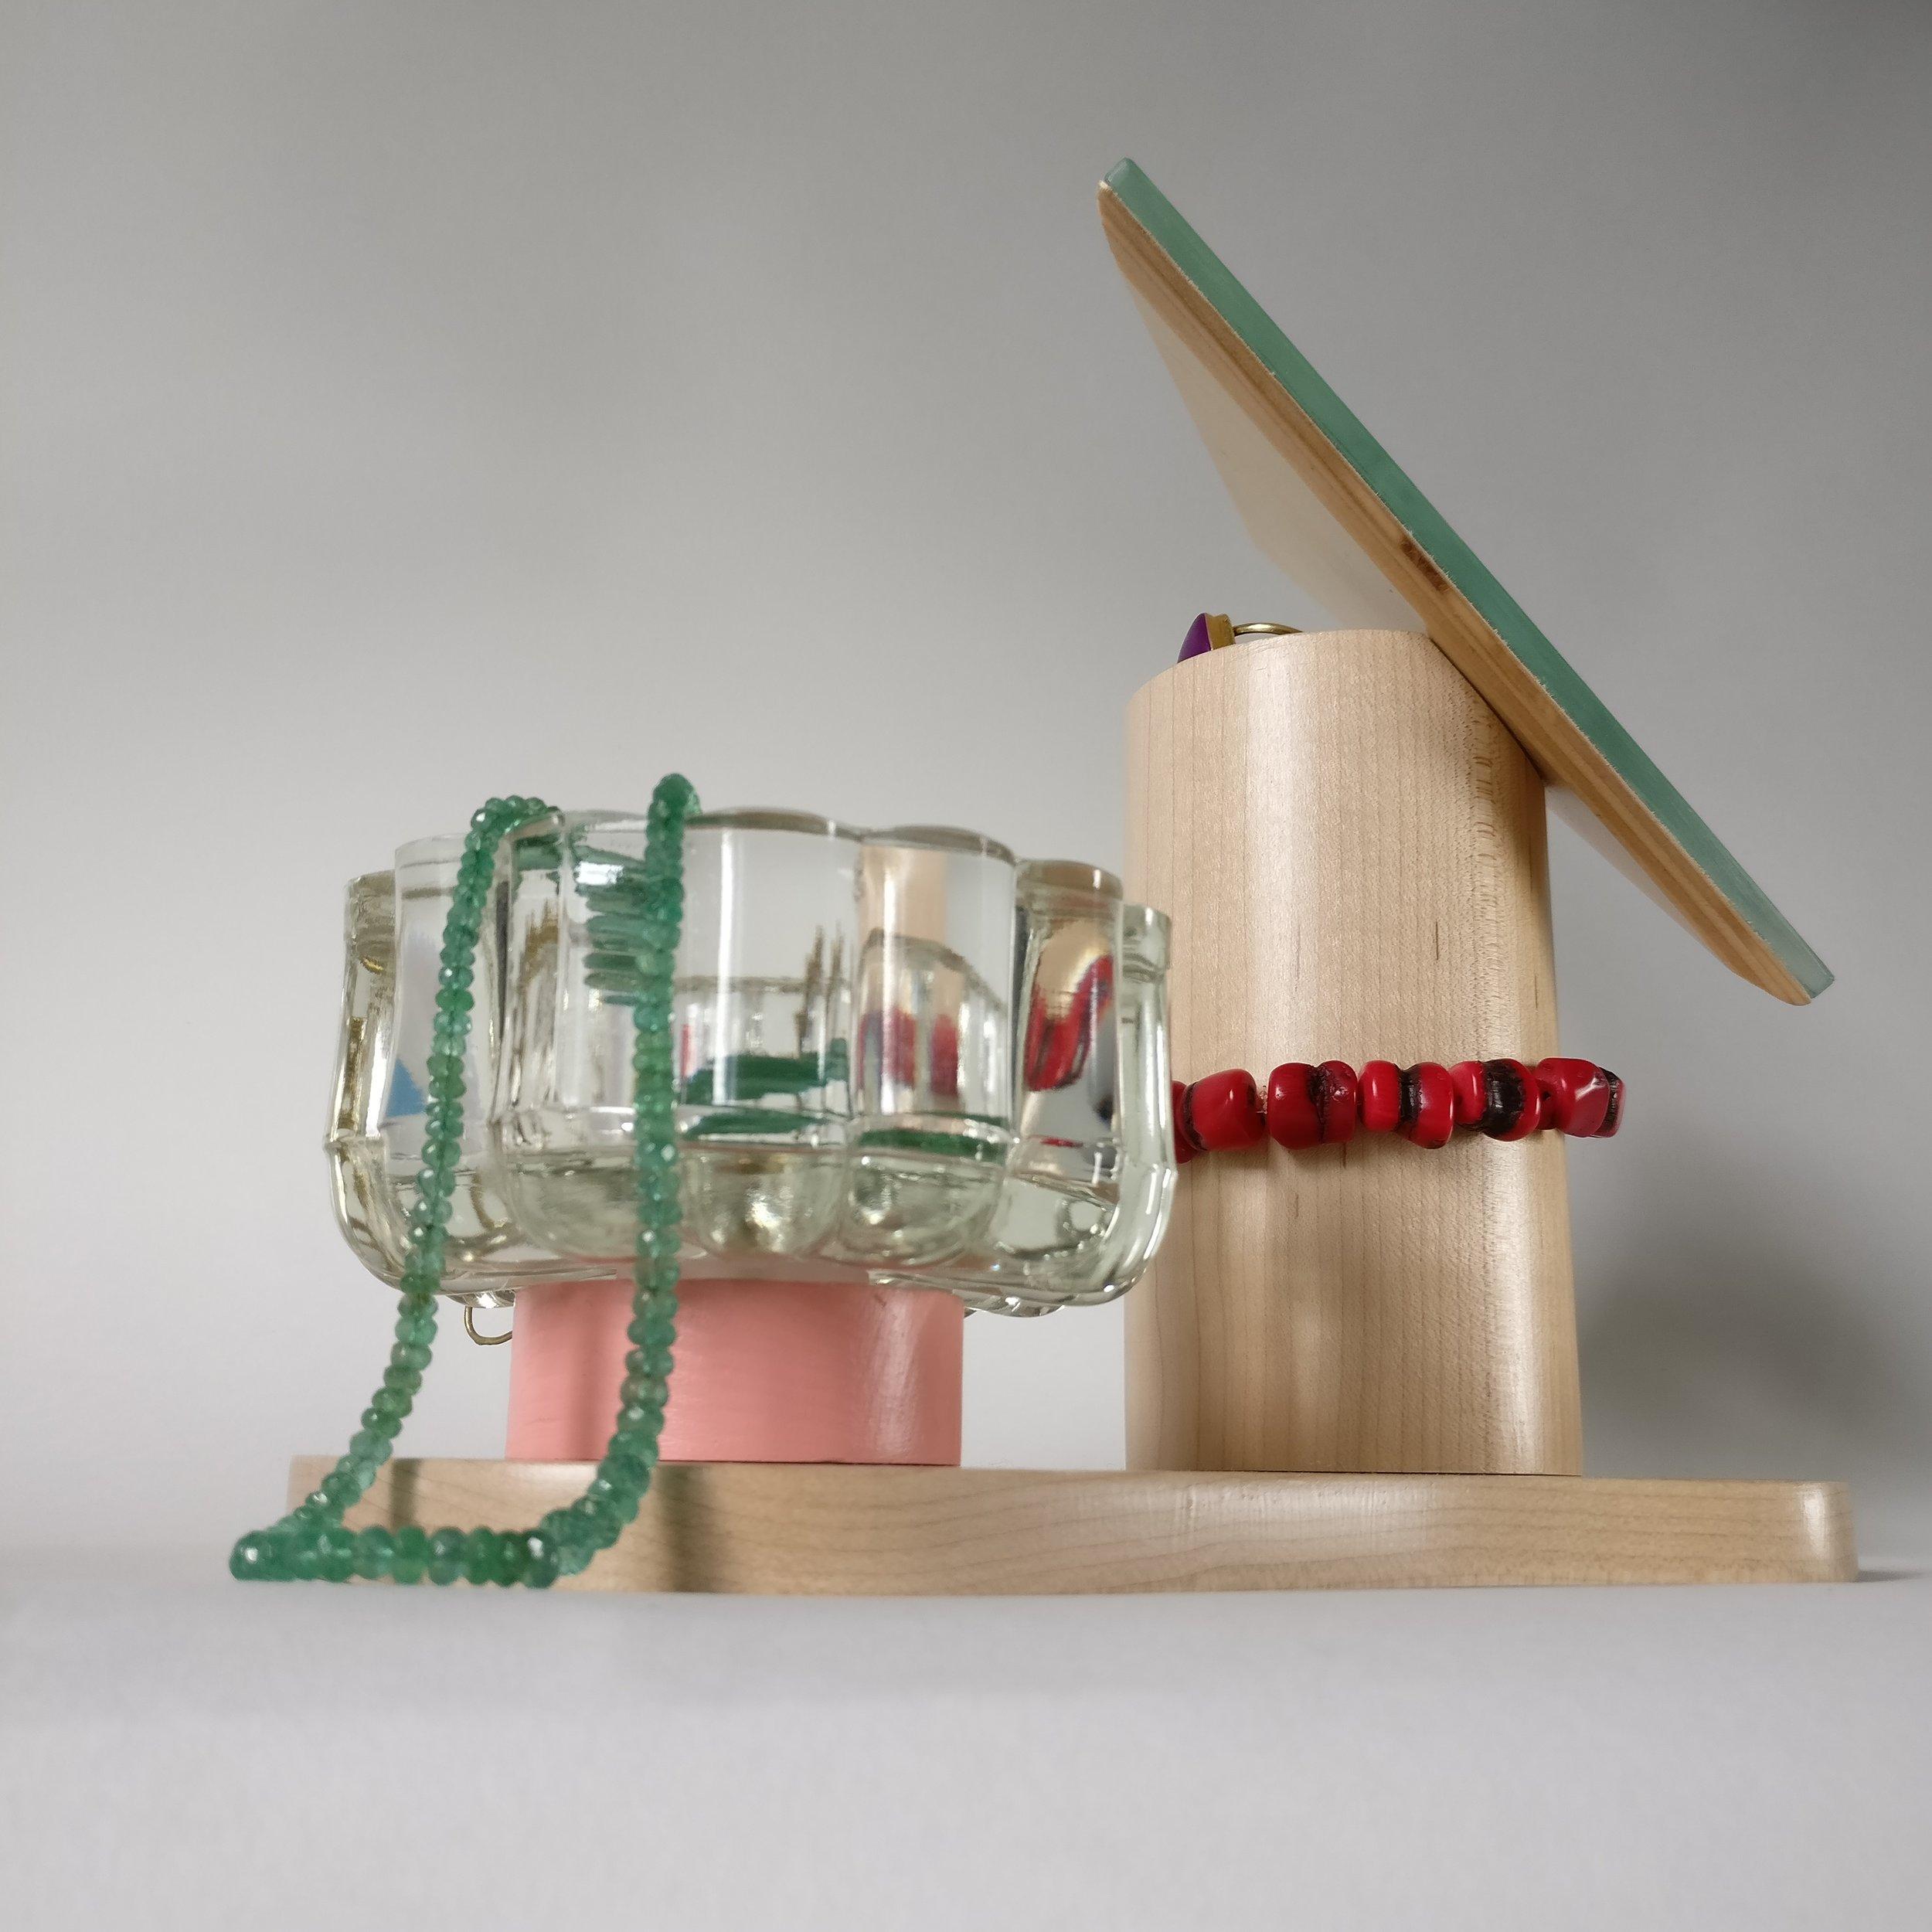 Jewelrt box, totem, wood, design, projet eight eight, projet huit huit, Myriam Rigaud, designer, memphis, geometric, Pink 90's